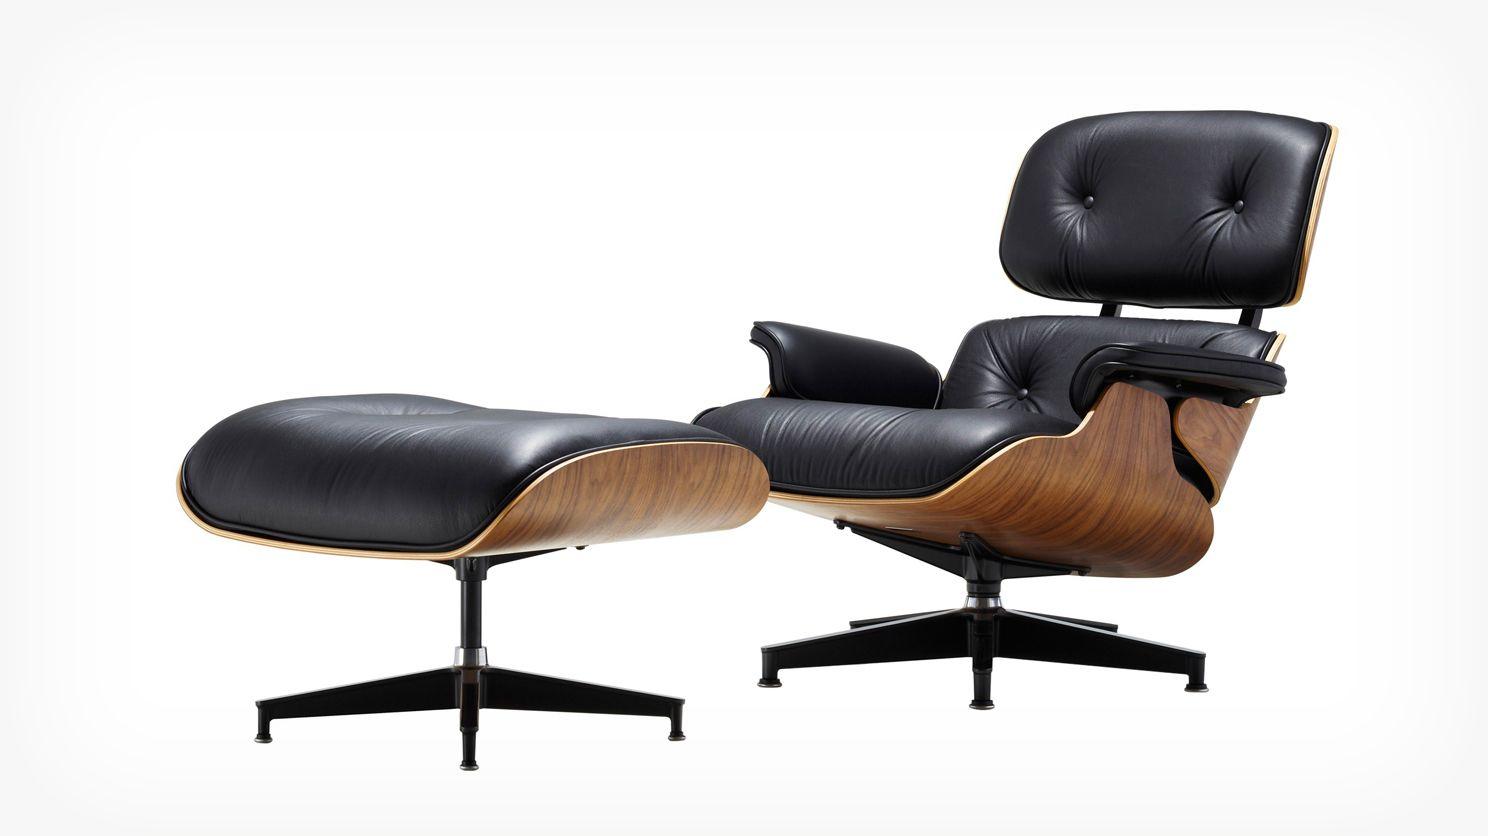 Eames Lounge Chair And Ottoman Eq3 Modern Furniture Eames